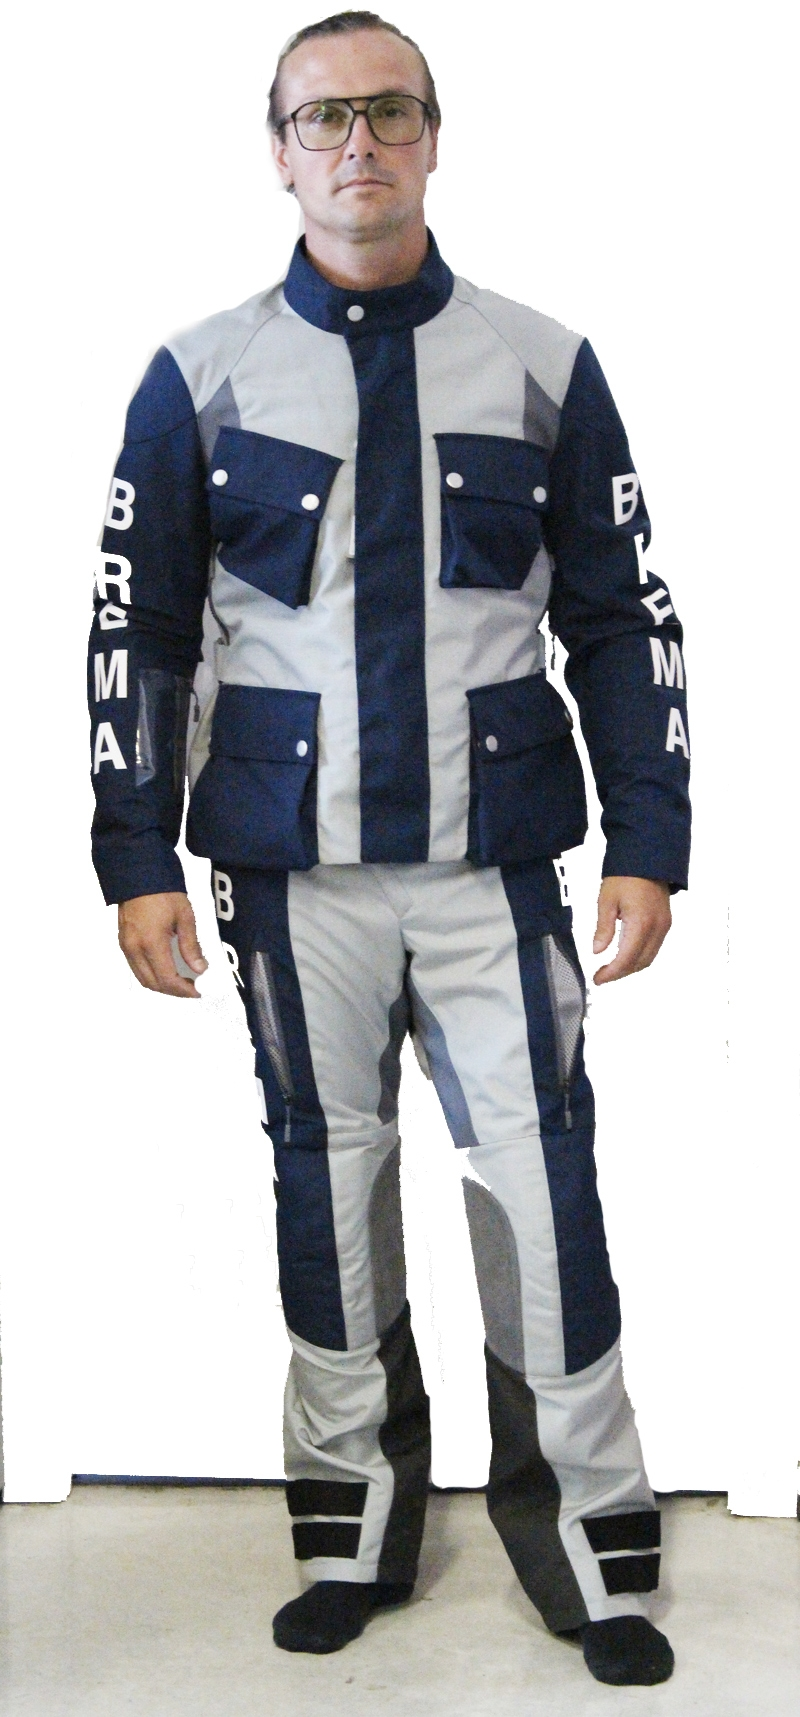 Giacca e pantalone Brema SILVER VASE ADVS-Man Navy Grey 1